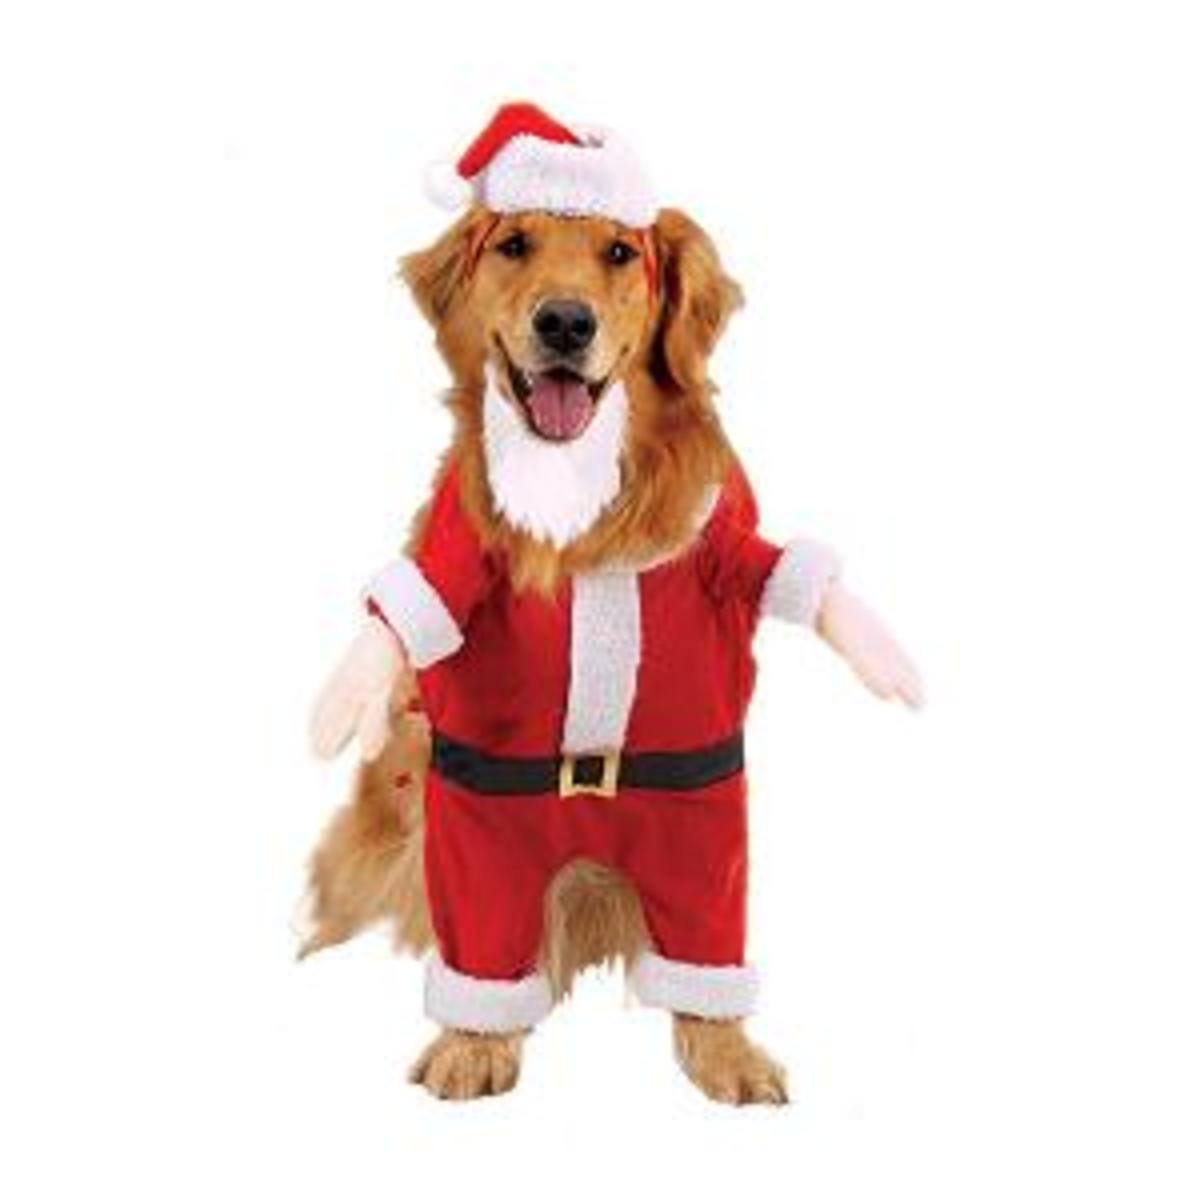 Santa Claus Costumes by MakinBacon